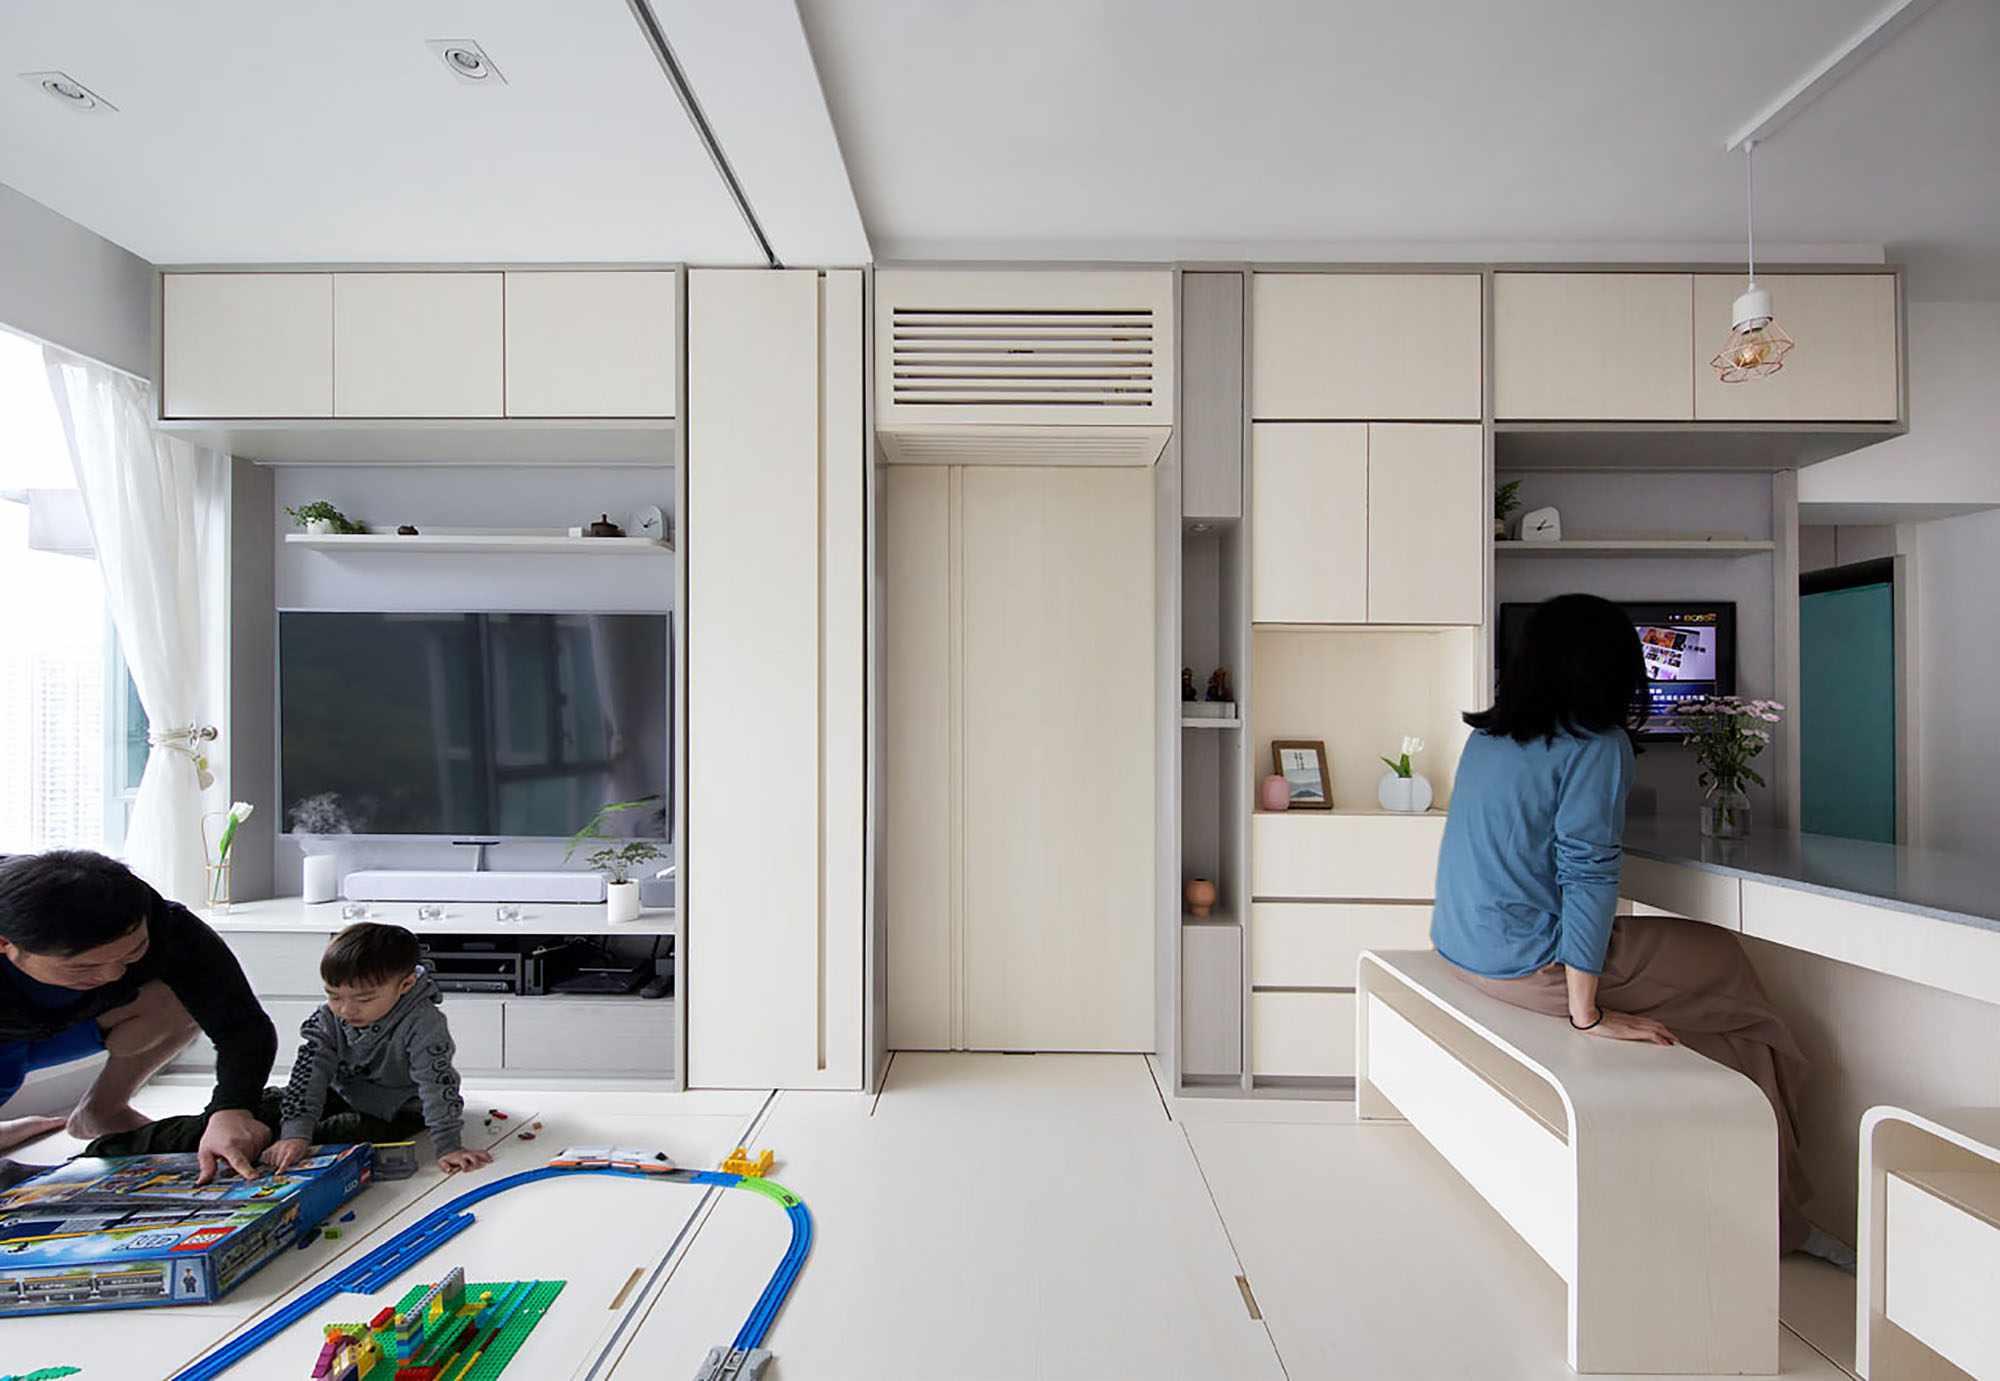 Smart Zendo micro-apartment by Sim-Plex Design Studio living room and kitchen